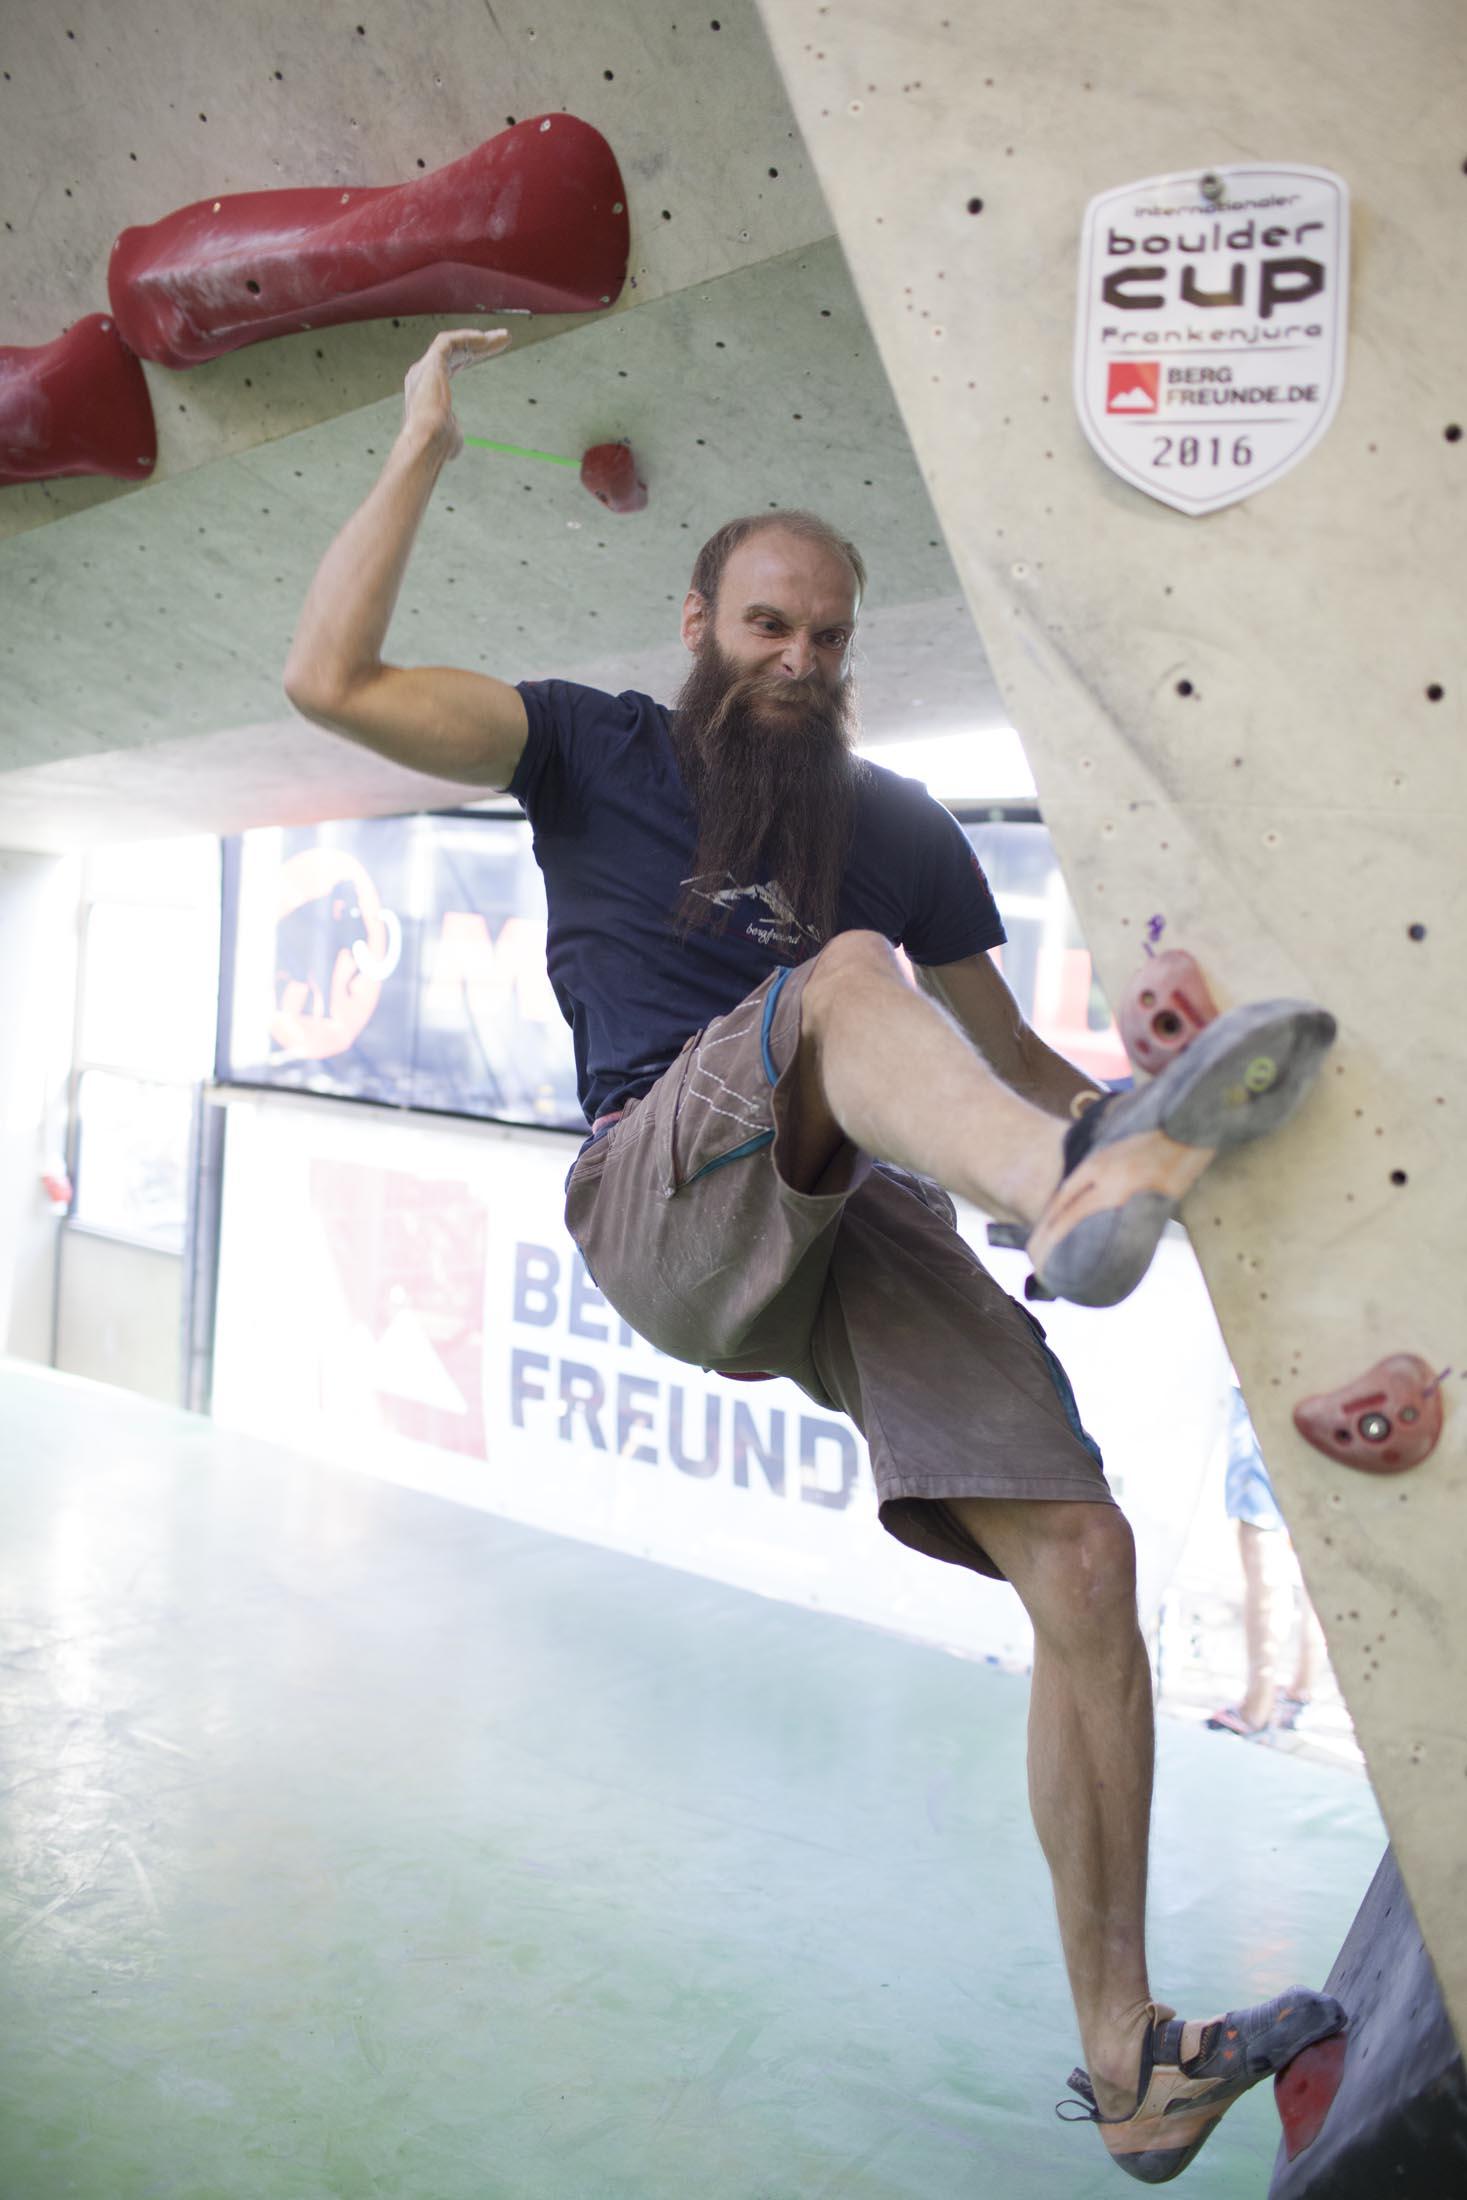 Finale, internationaler bouldercup Frankenjura 2016, BLOCKHELDEN Erlangen, Mammut, Bergfreunde.de, Boulderwettkampf07092016591